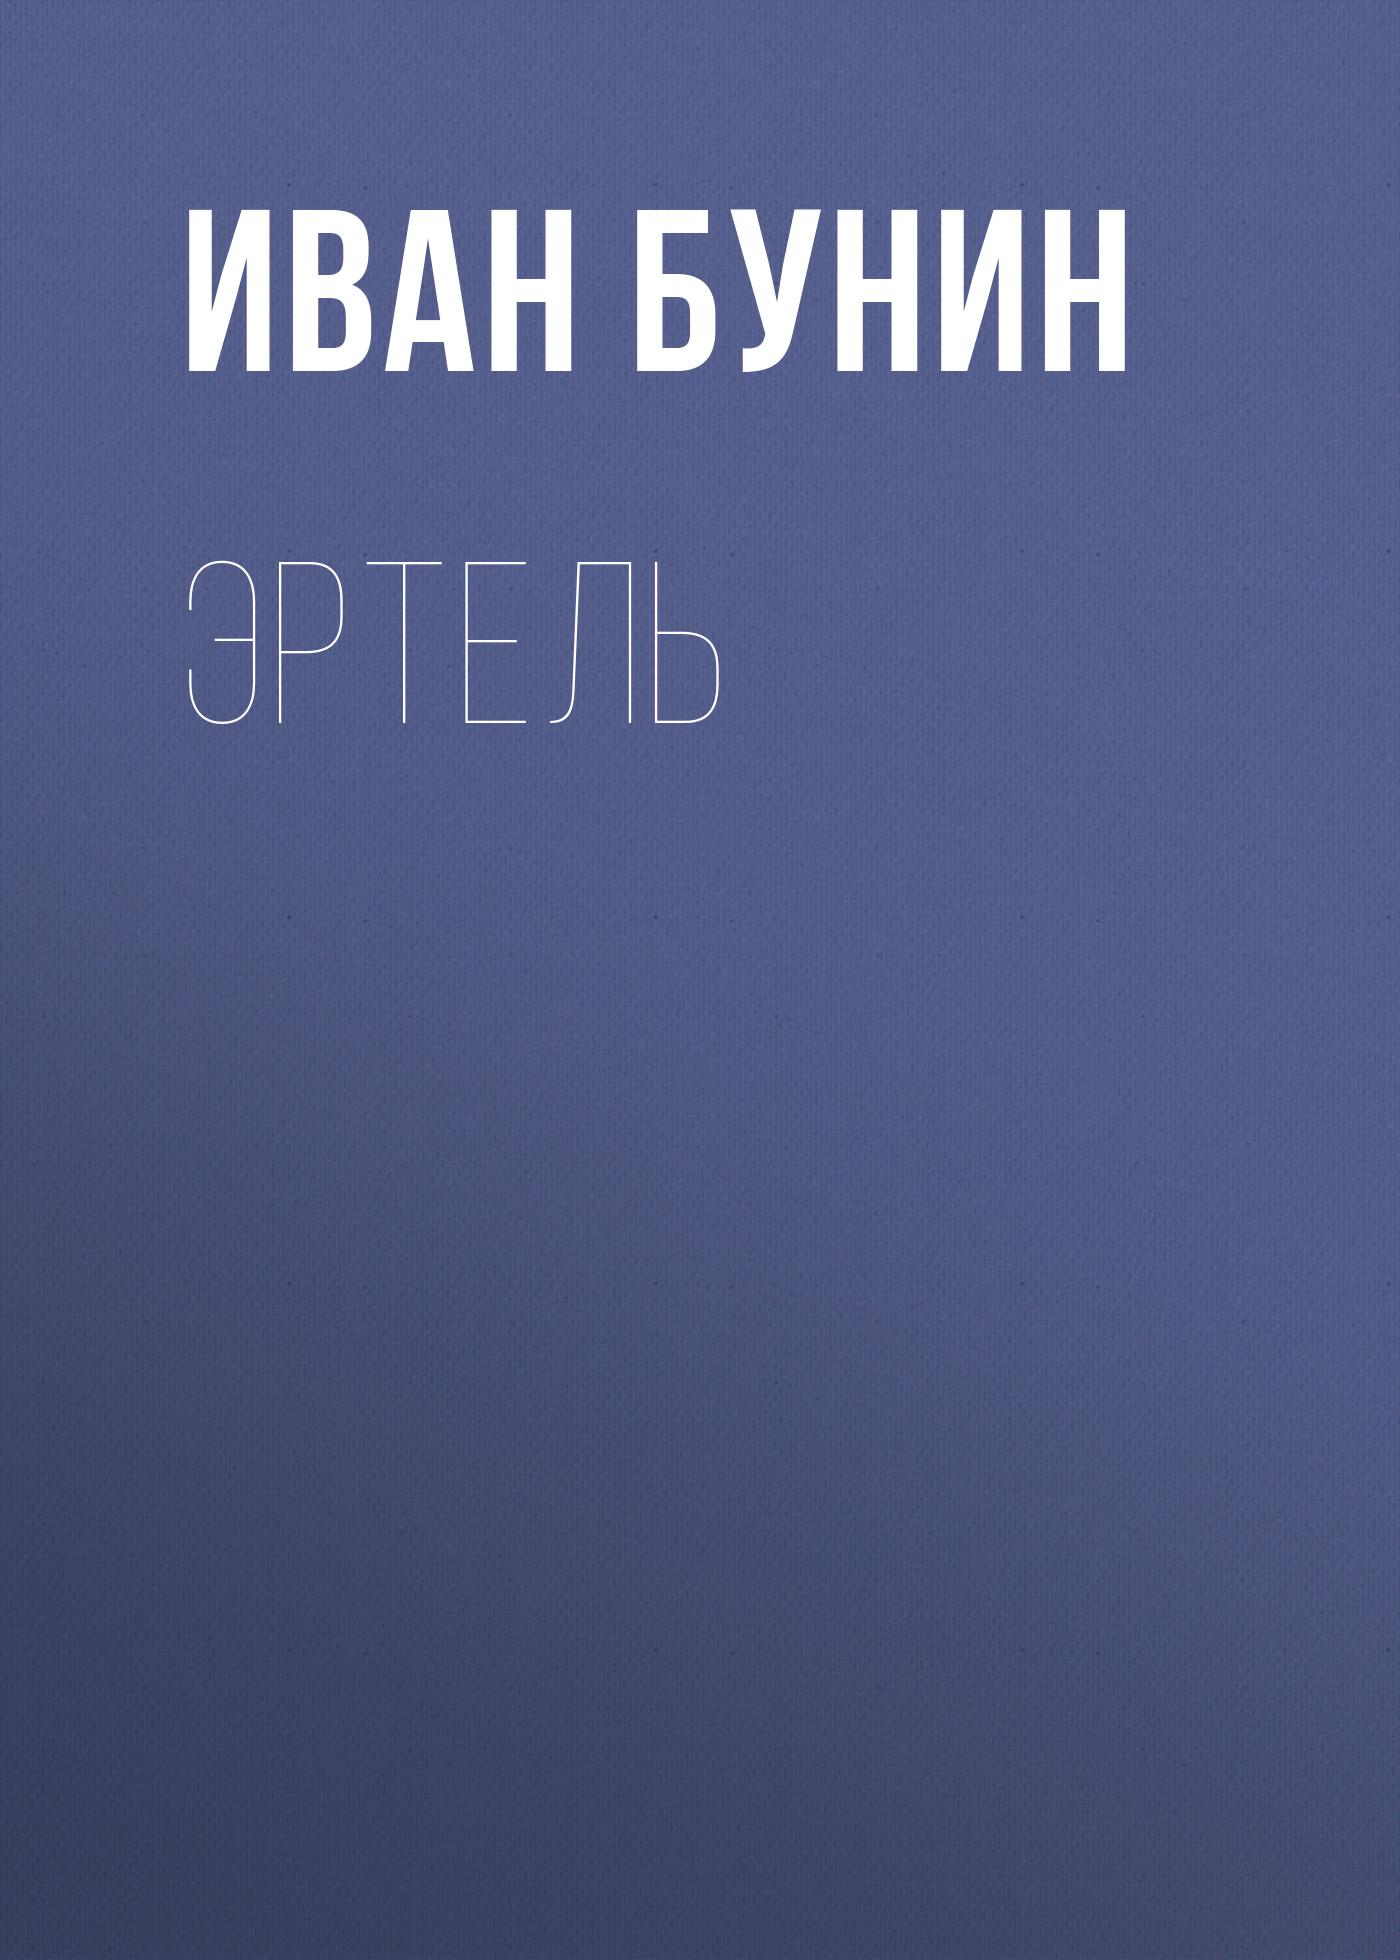 цена на Иван Бунин Эртель